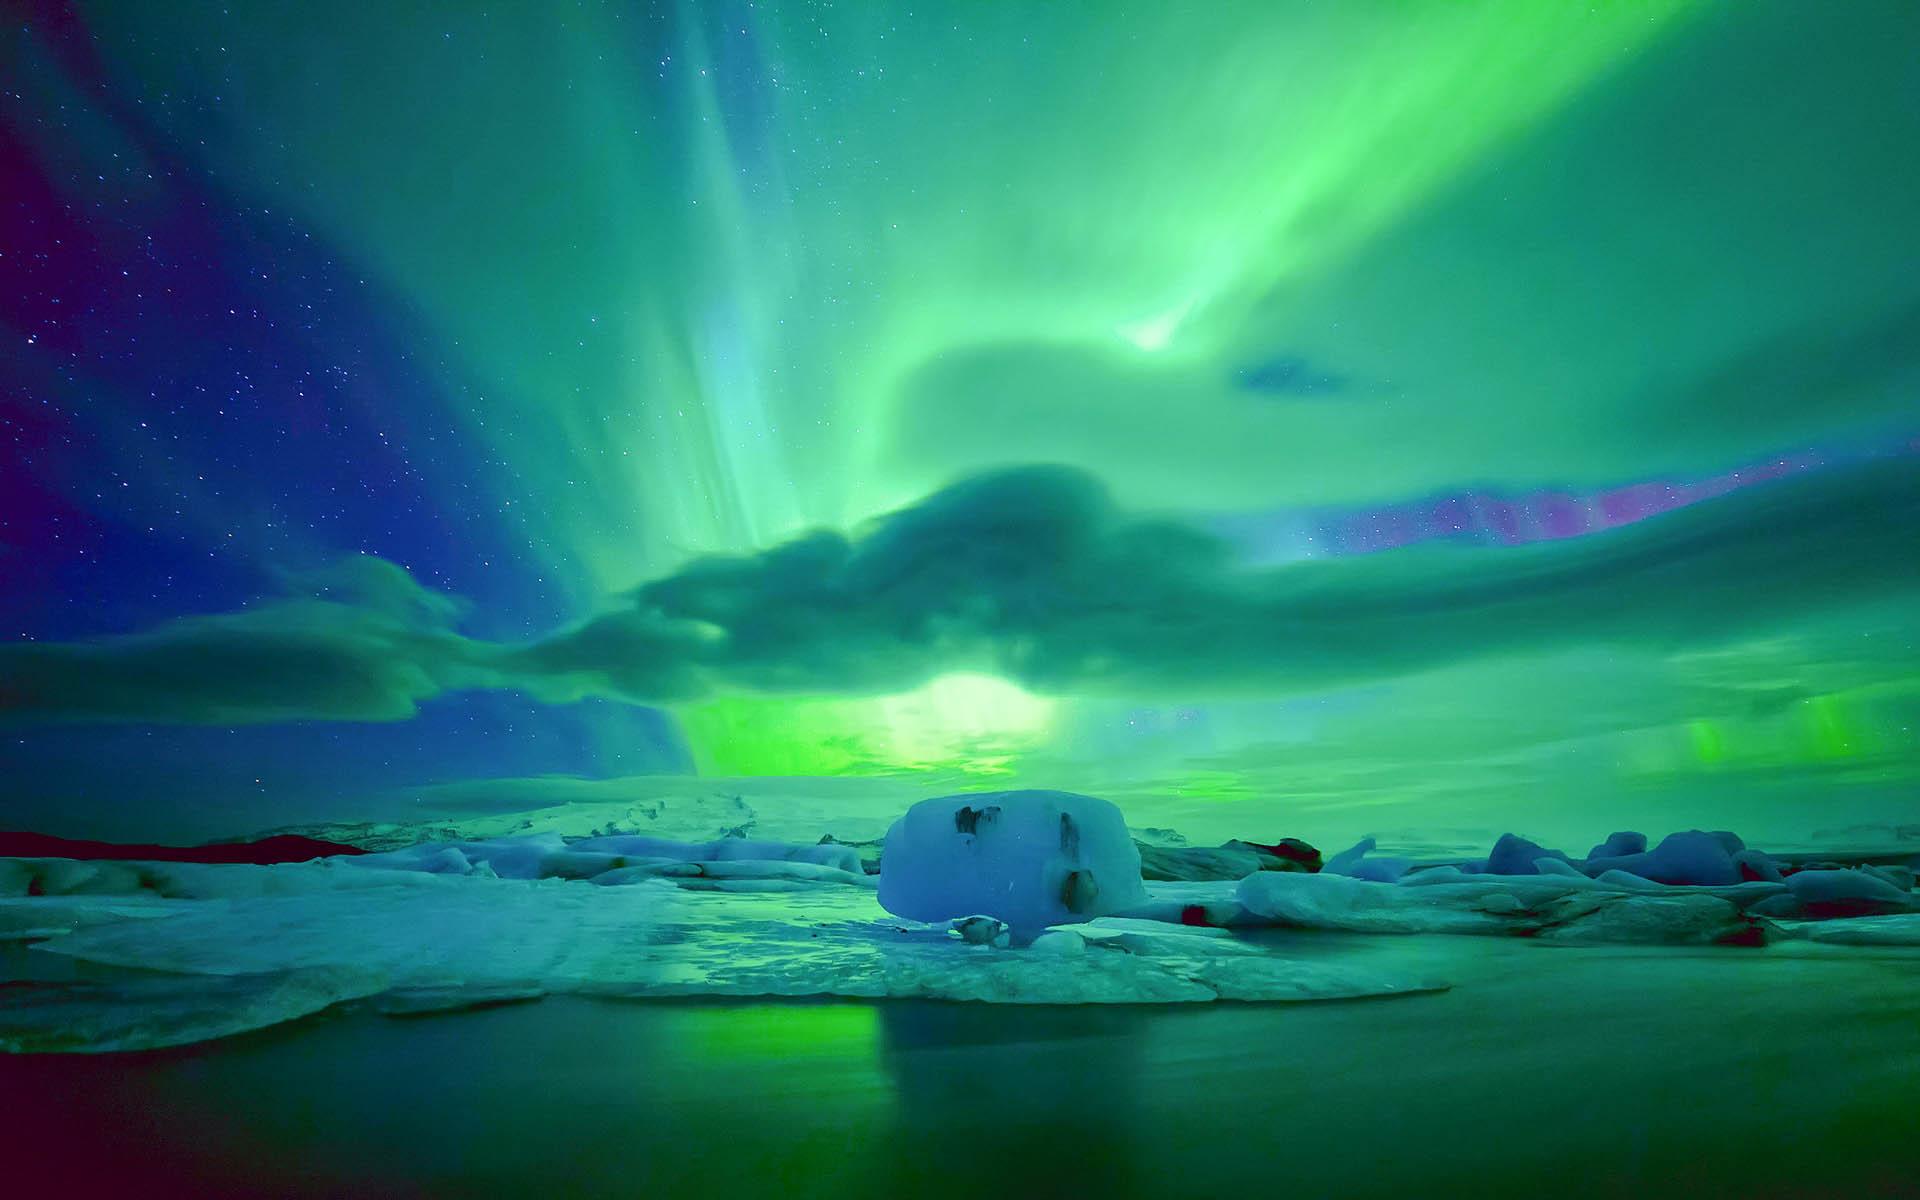 47 aurora borealis wallpaper moving on wallpapersafari - Wallpaper definition ...